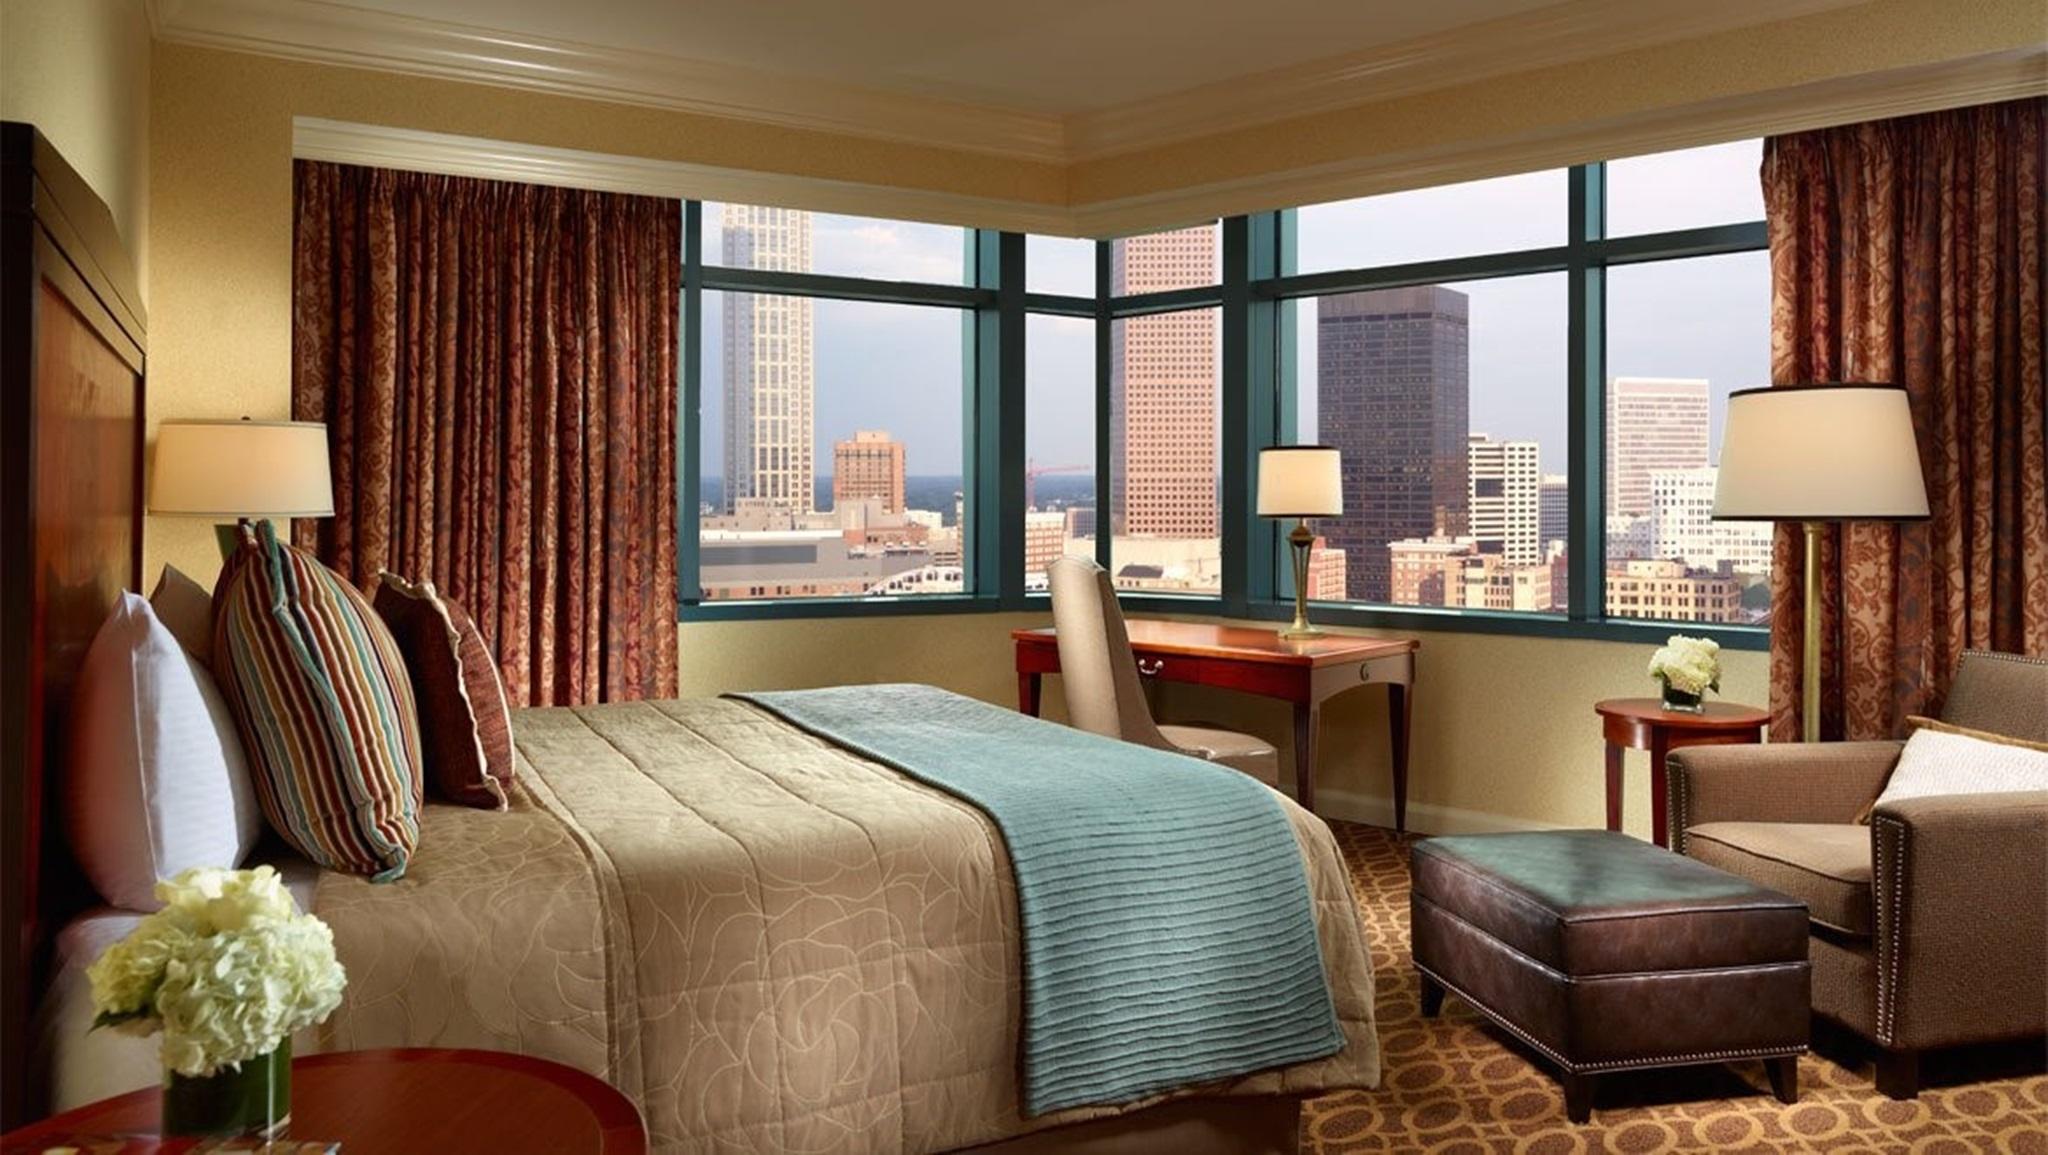 Excellent Omni Atlanta Hotel At Cnn Center In Atlanta Ga Room Home Interior And Landscaping Analalmasignezvosmurscom